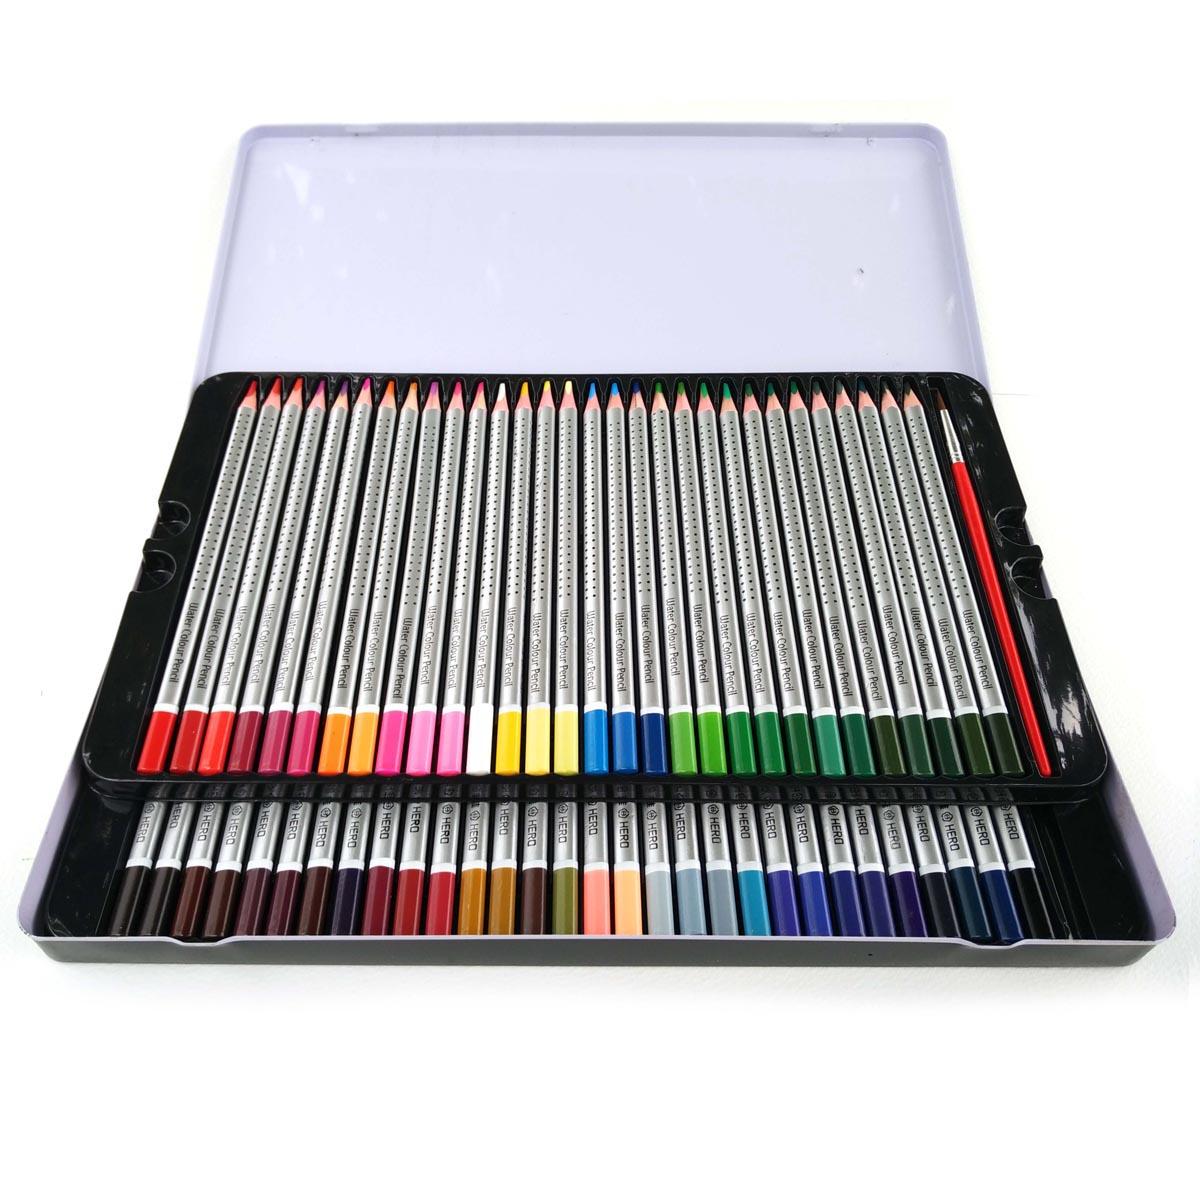 Hero 72 Colors Pencils Artist Sketch Lapices De 72 Colores Secret Garden Naravni les Nestrupen akvarelni svinčnik na debelo